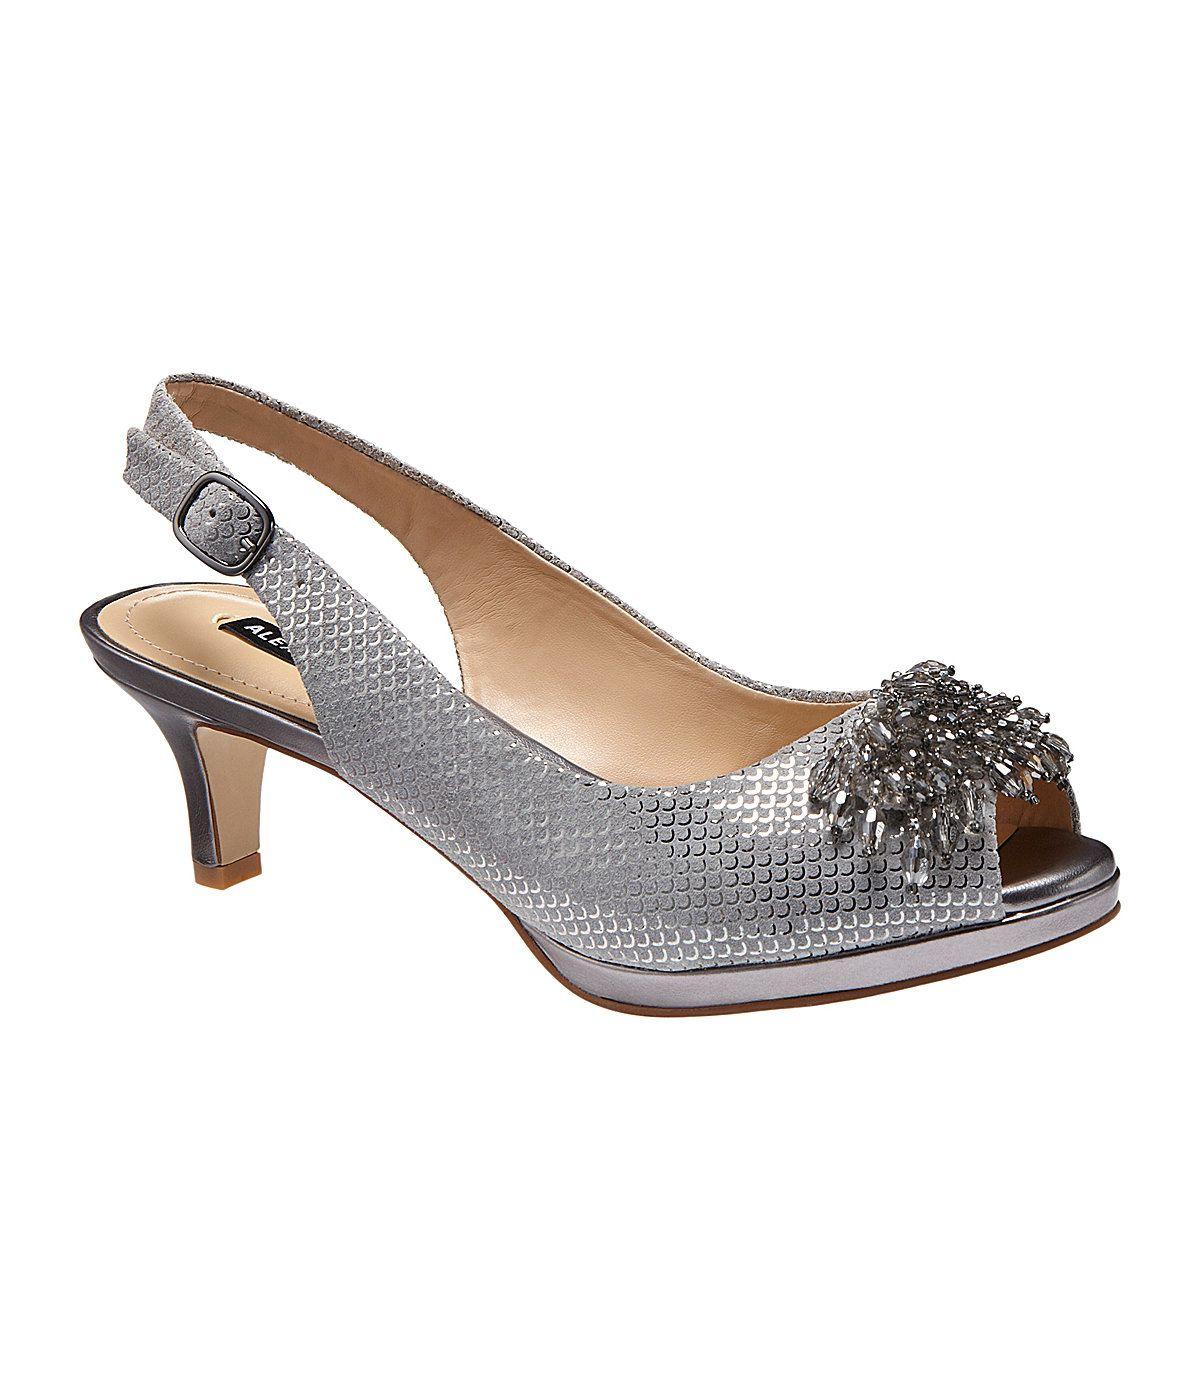 62485319936c Alex Marie Marla Jeweled Peep-Toe Pumps